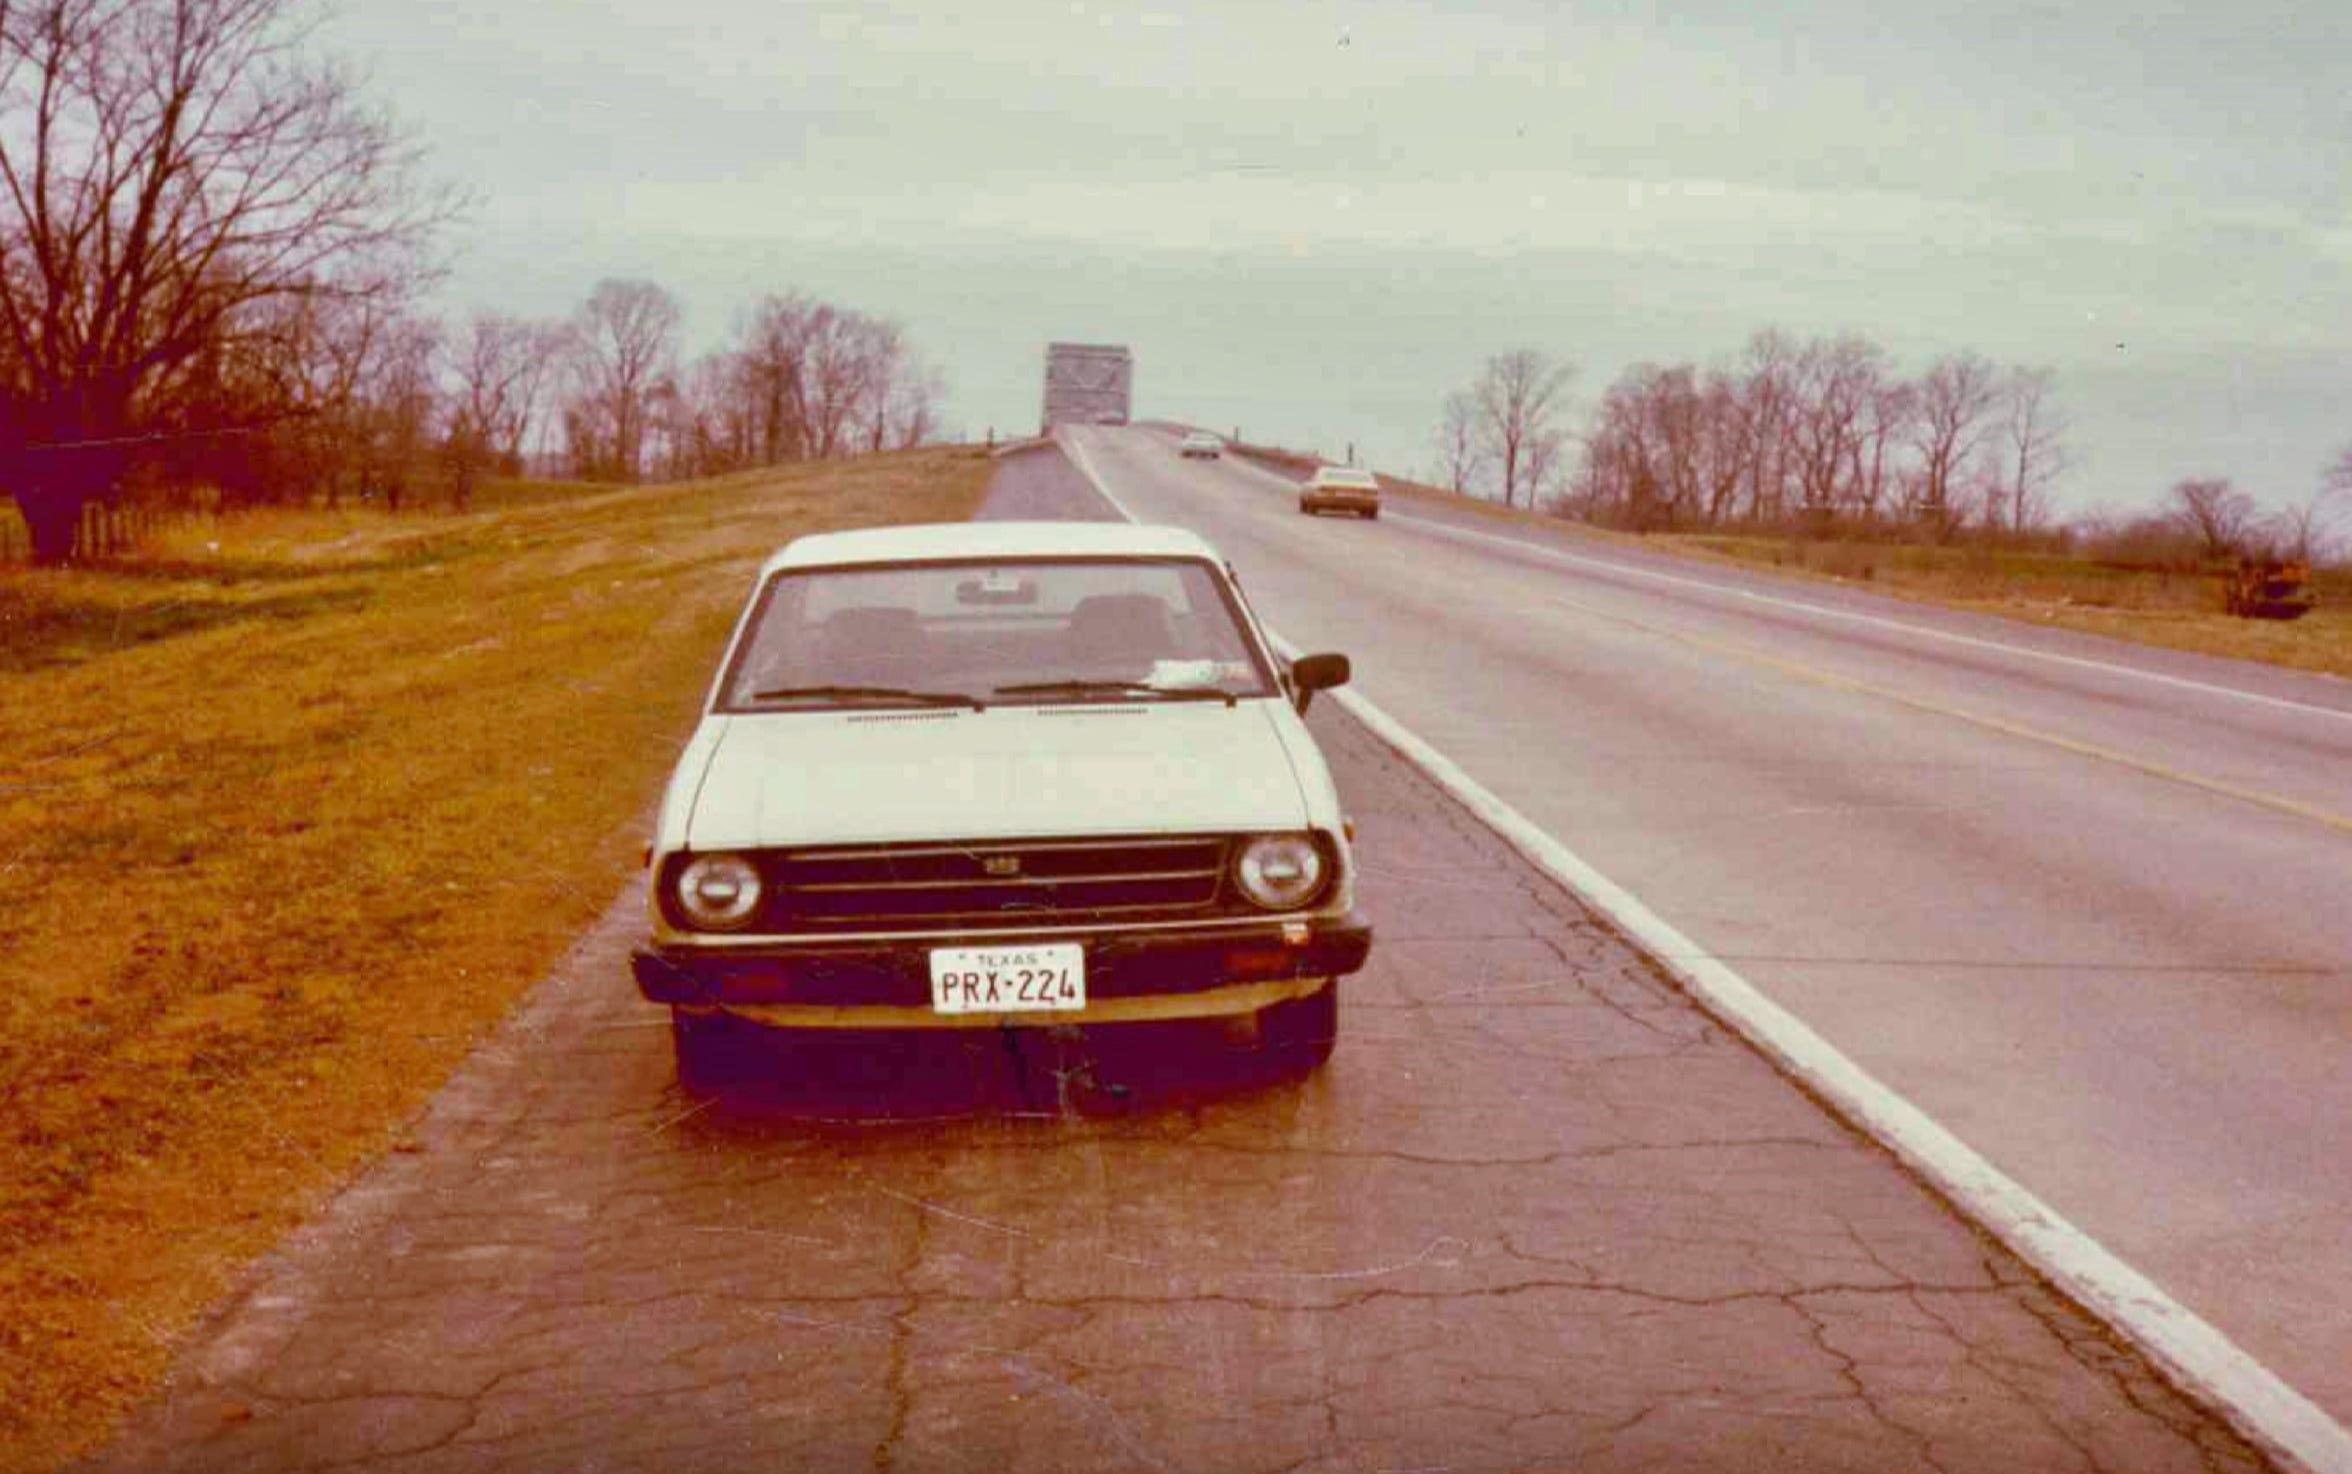 Arrilla Vaul's car was found abandoned in Bossier City, near the Jimmie Davis Bridge.